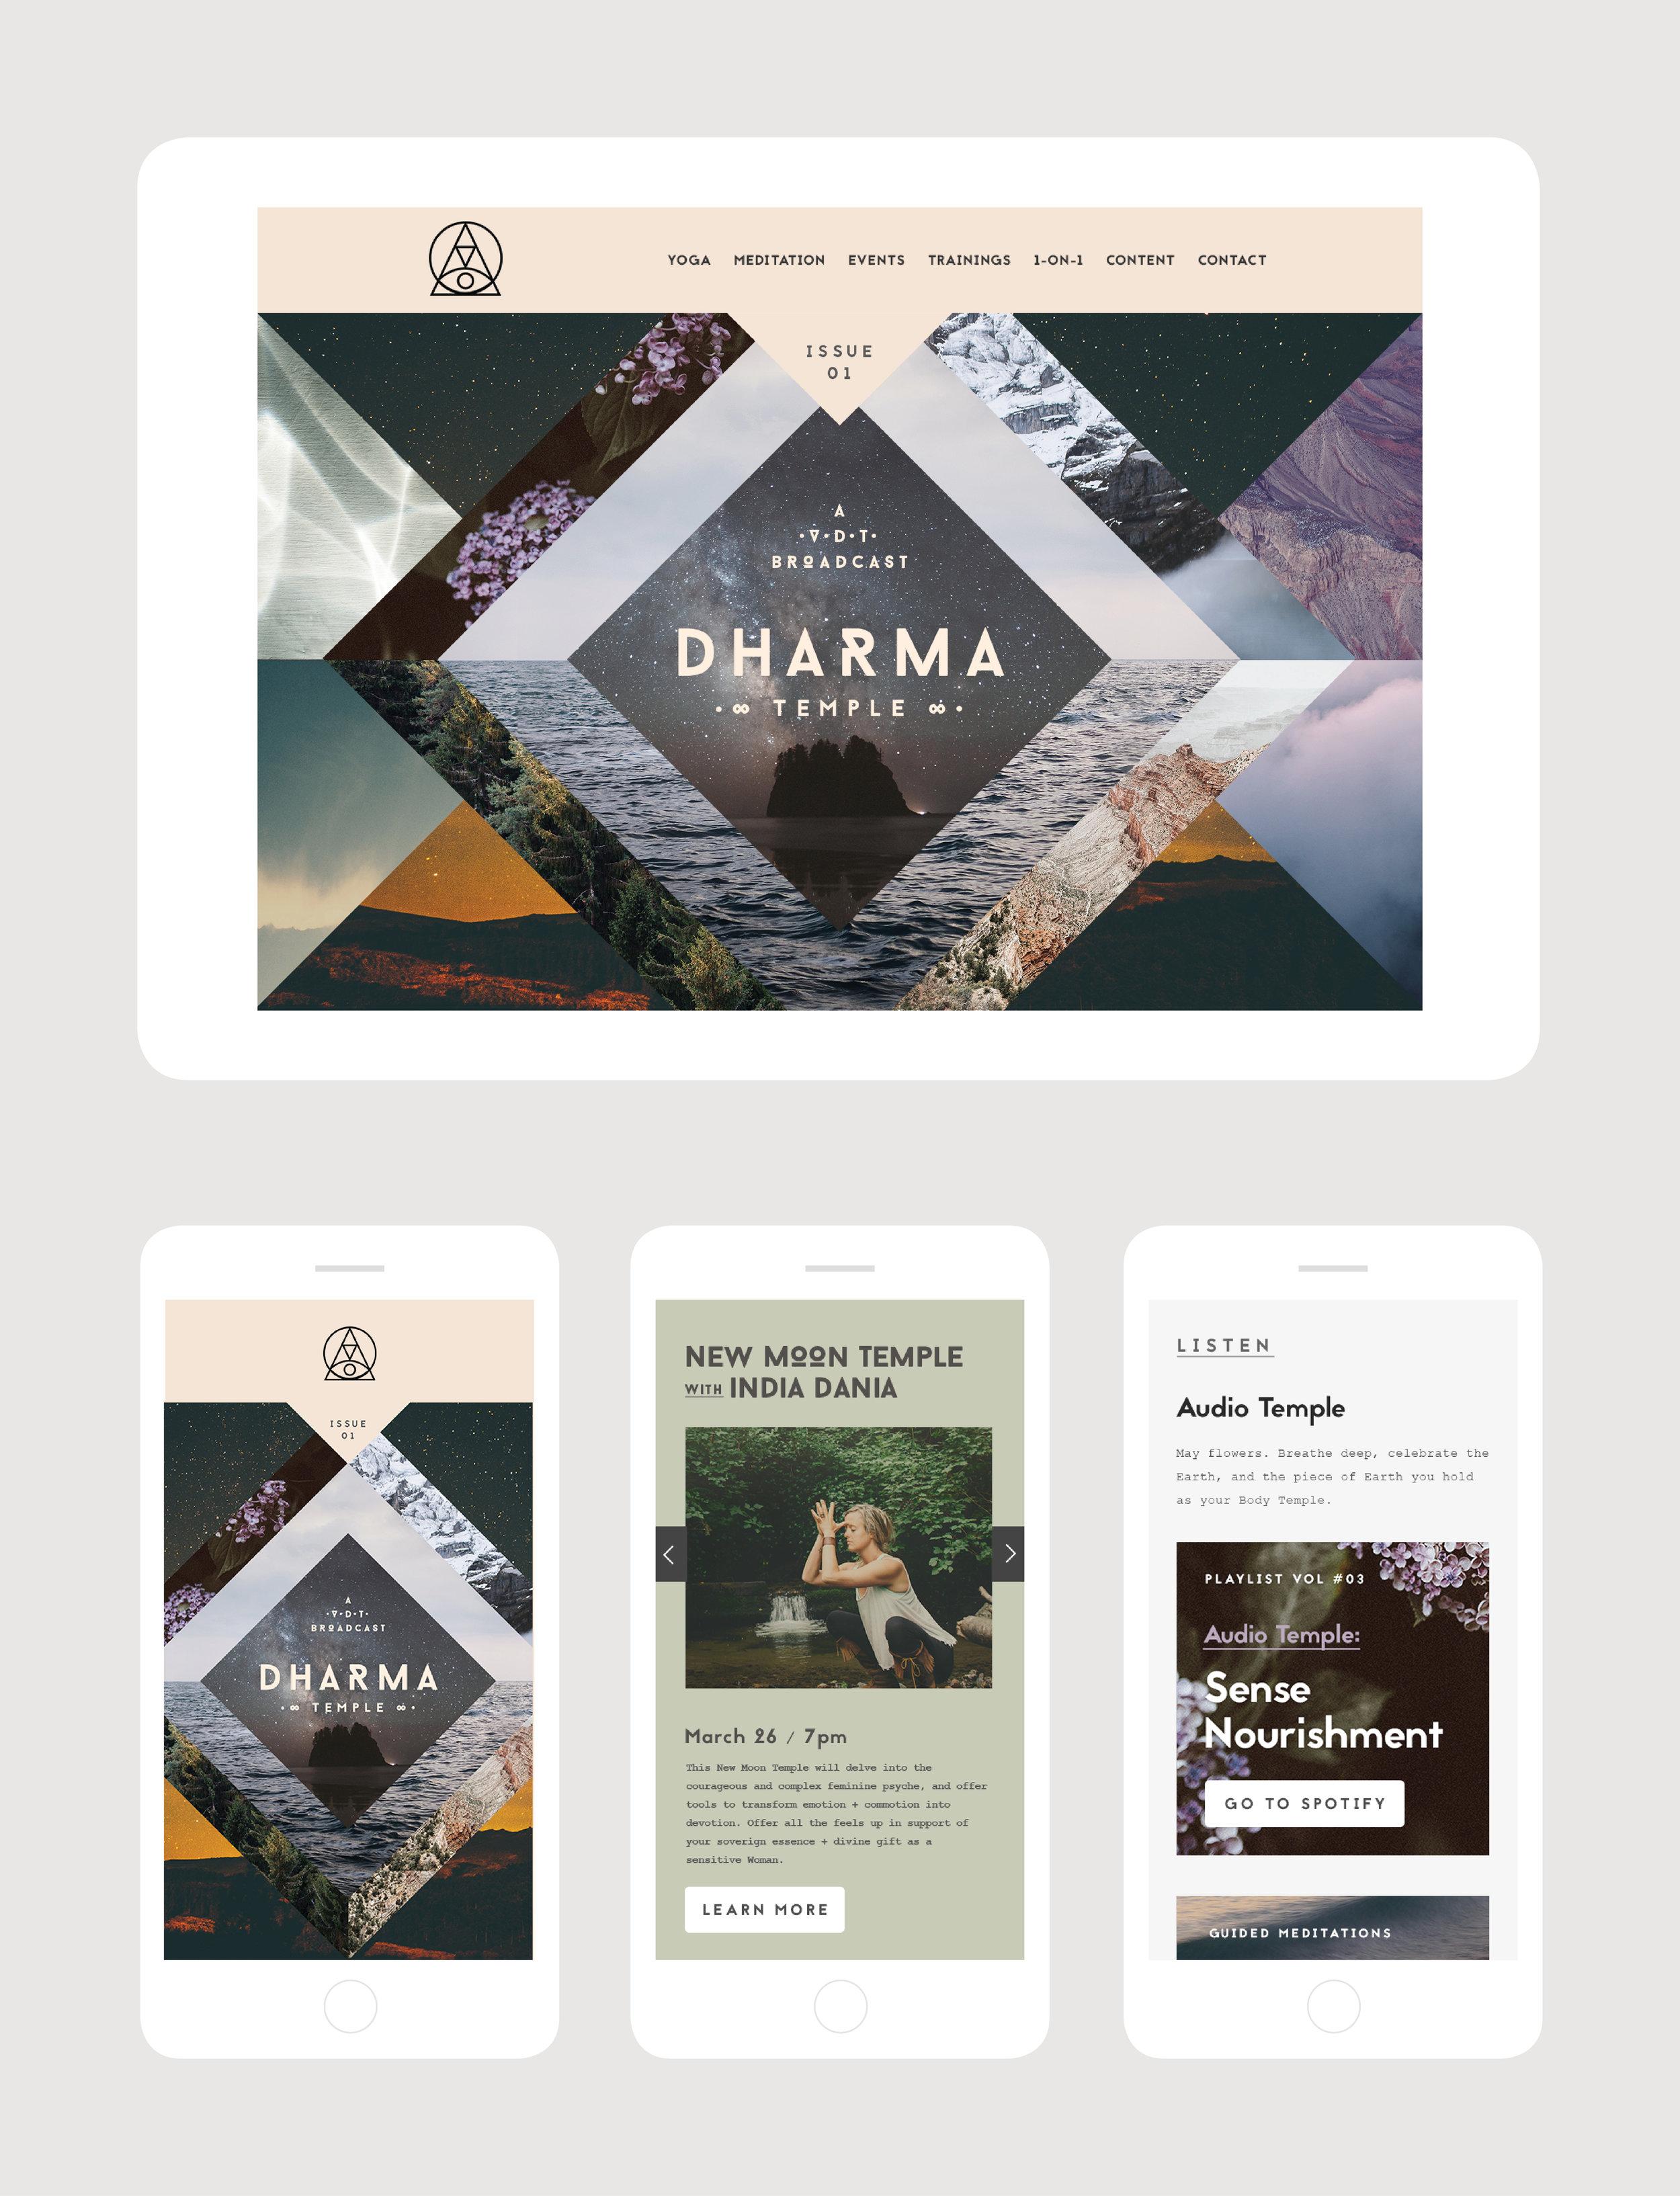 Digital artwork and web content design for an online newsletter